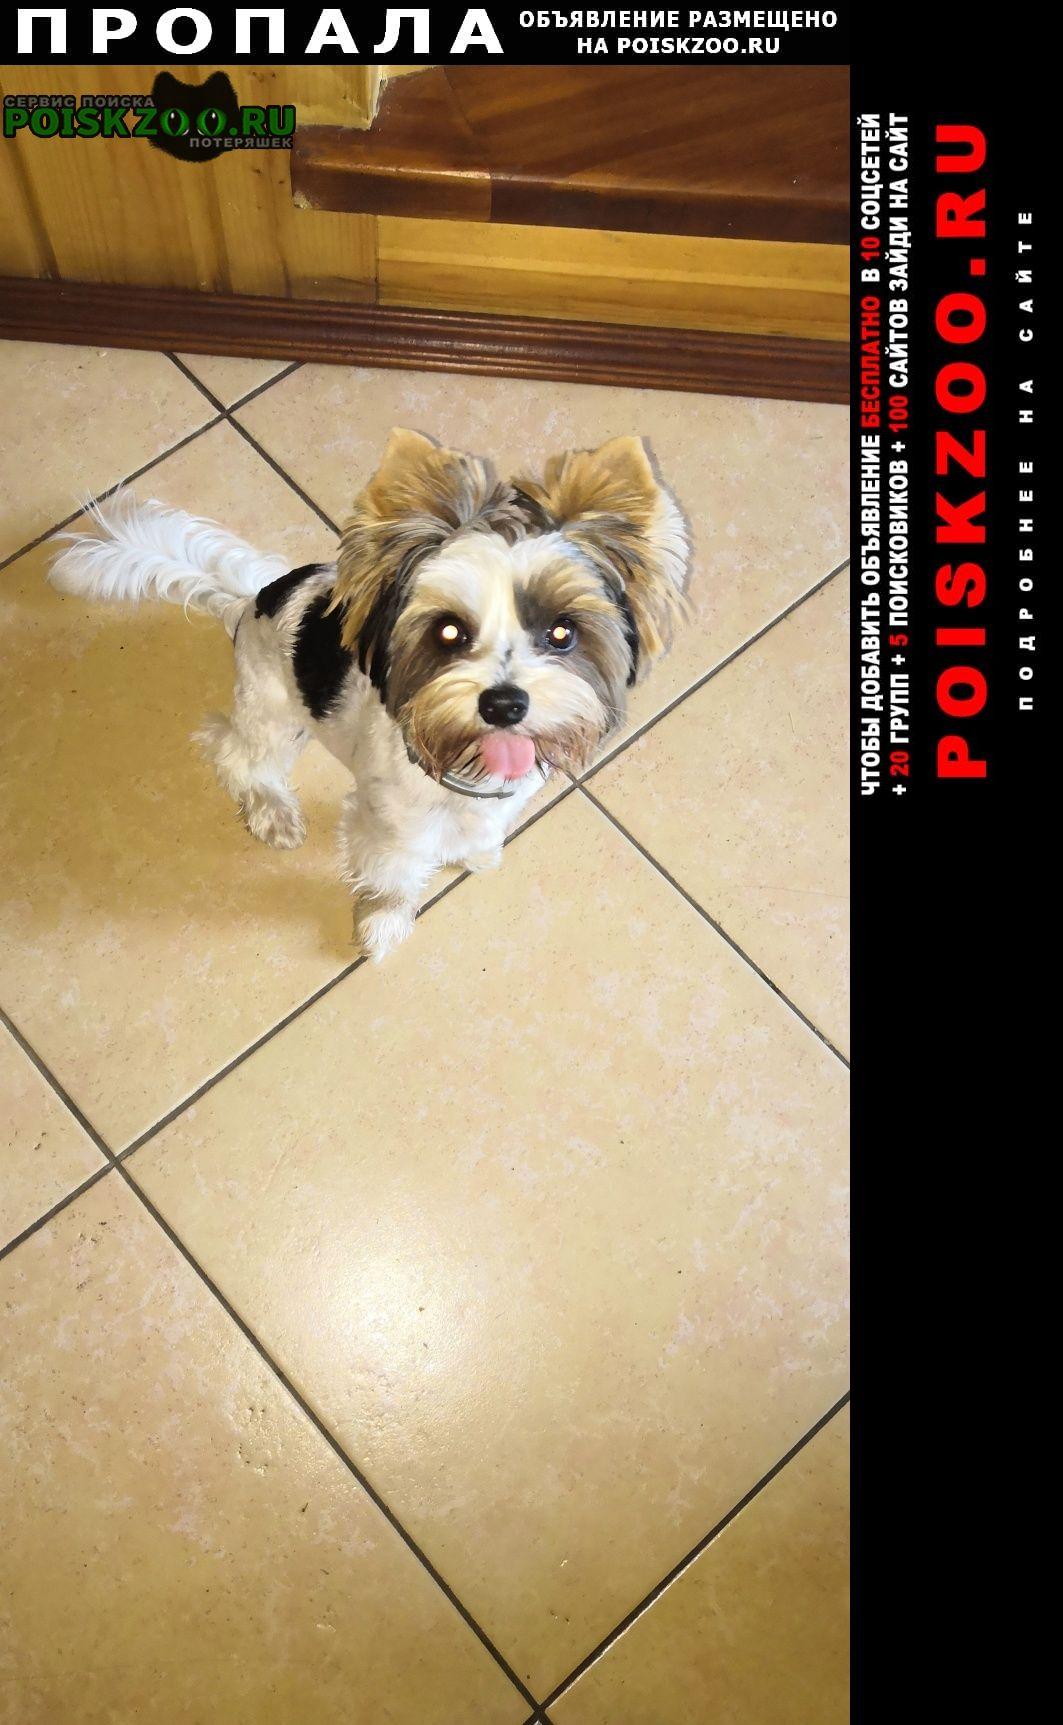 Пропала собака кобель бивер йорк Загорянский